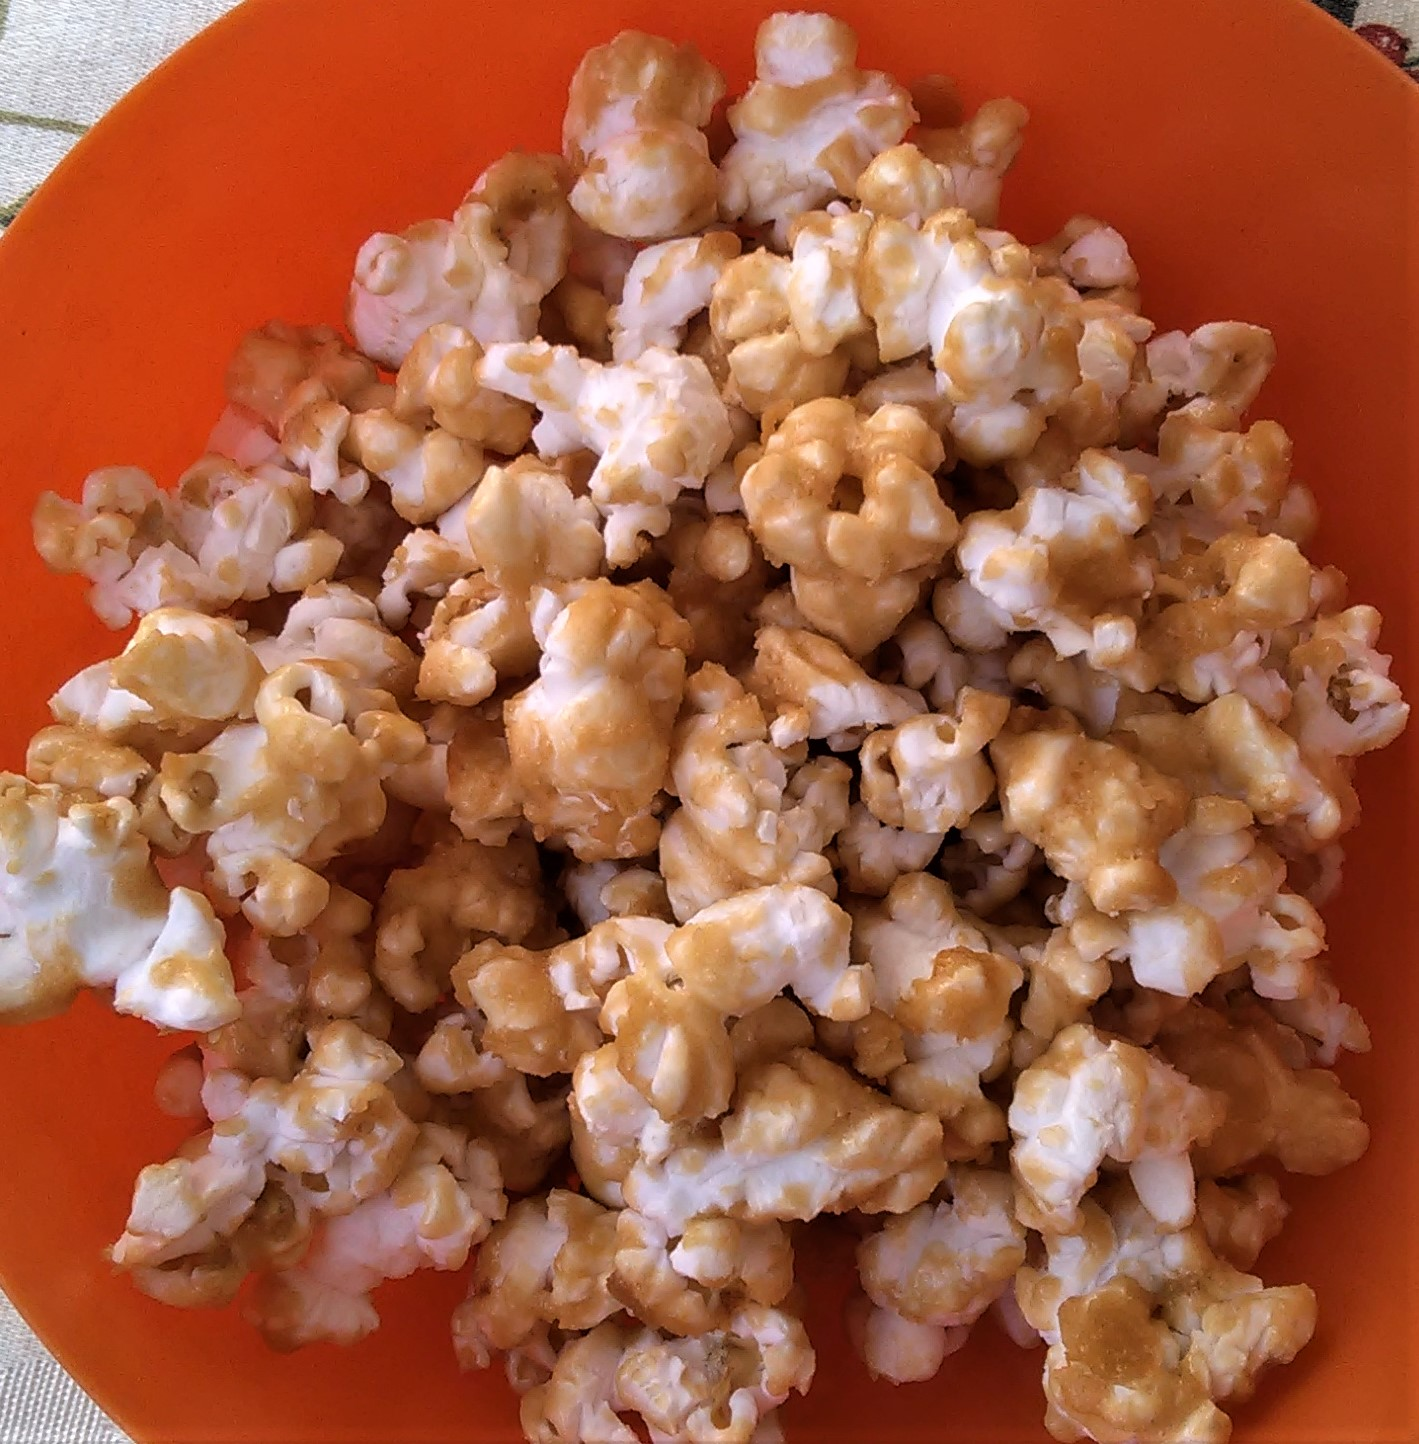 Baked Carmel Corn